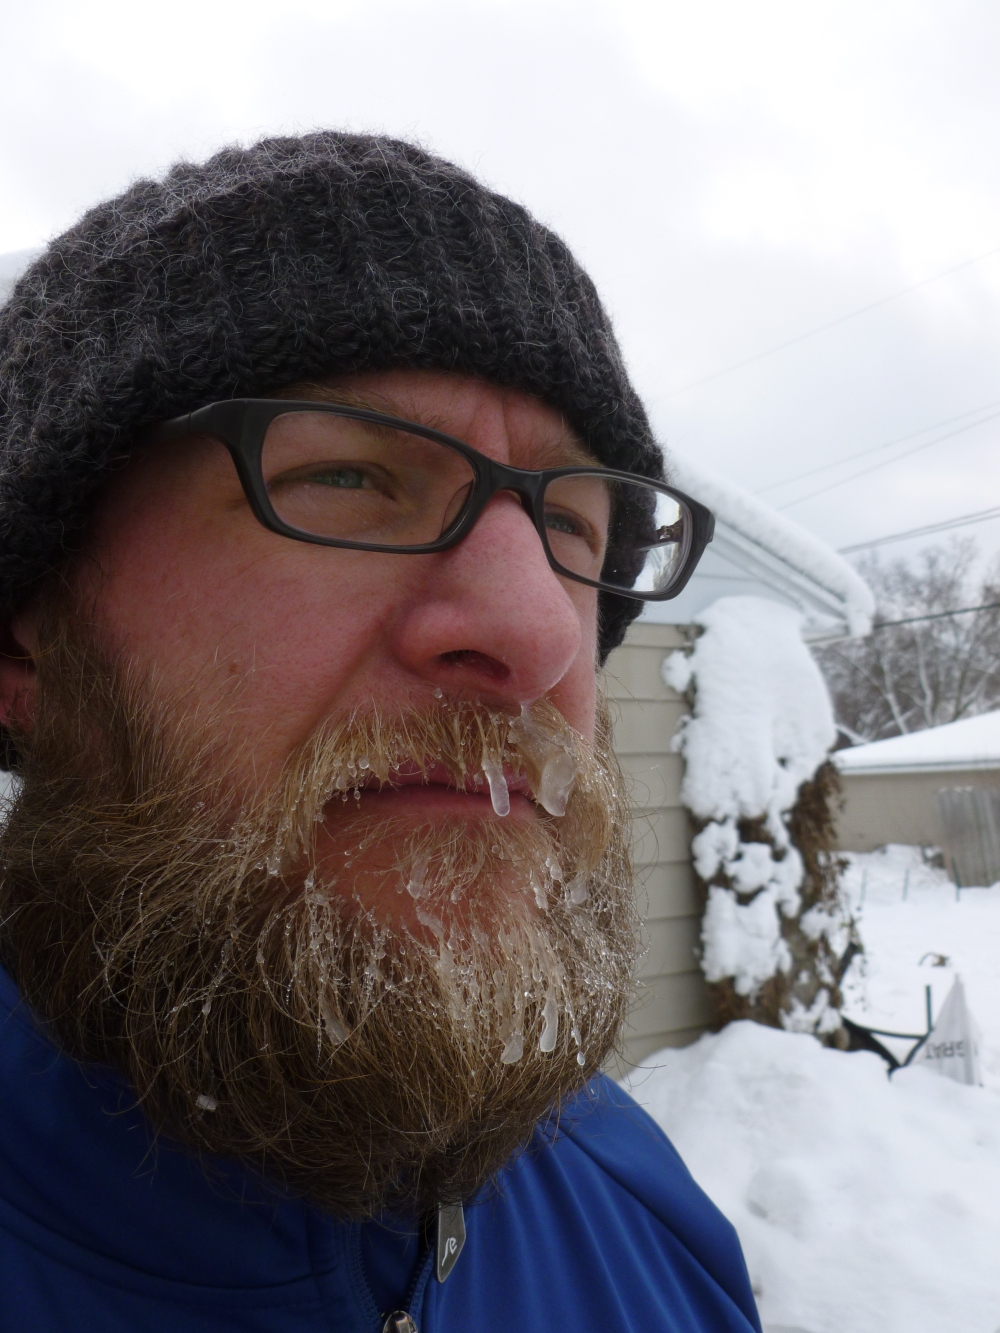 Icier beard